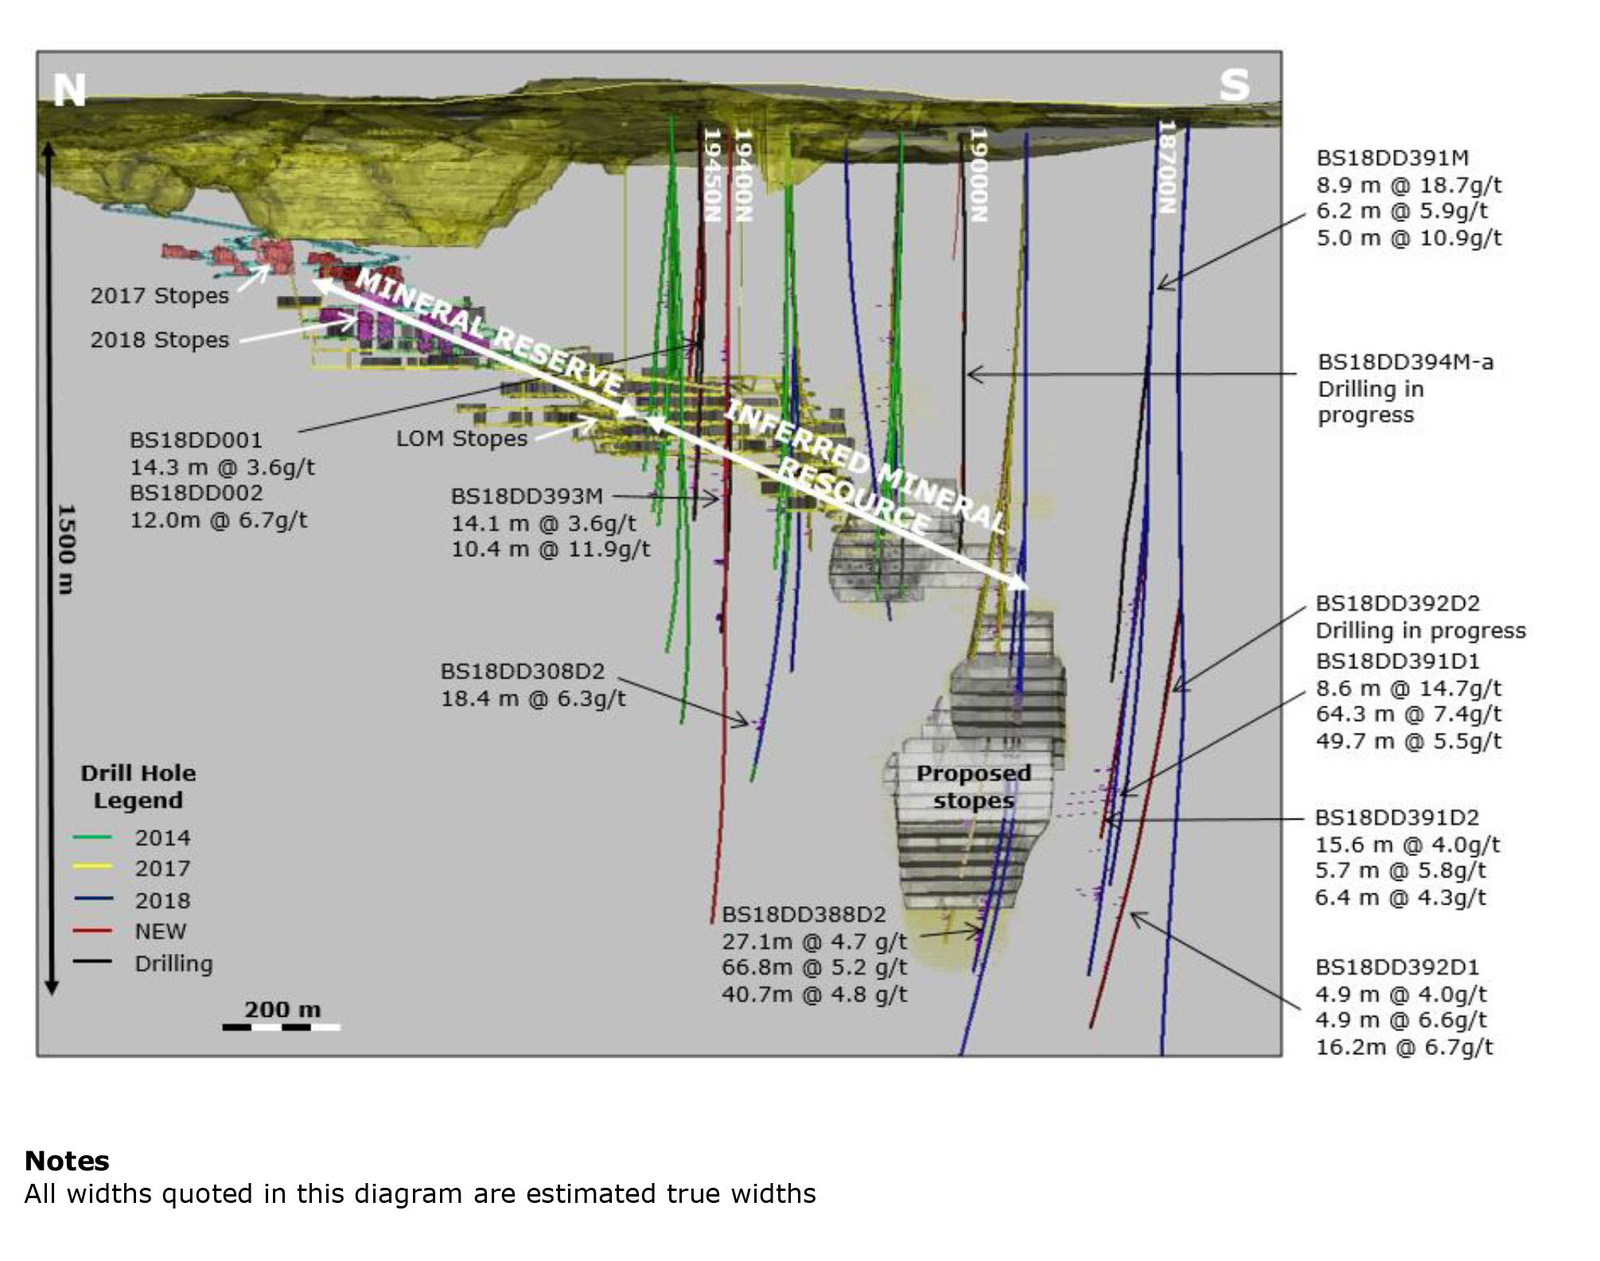 Wassa Underground: Isometric view looking East